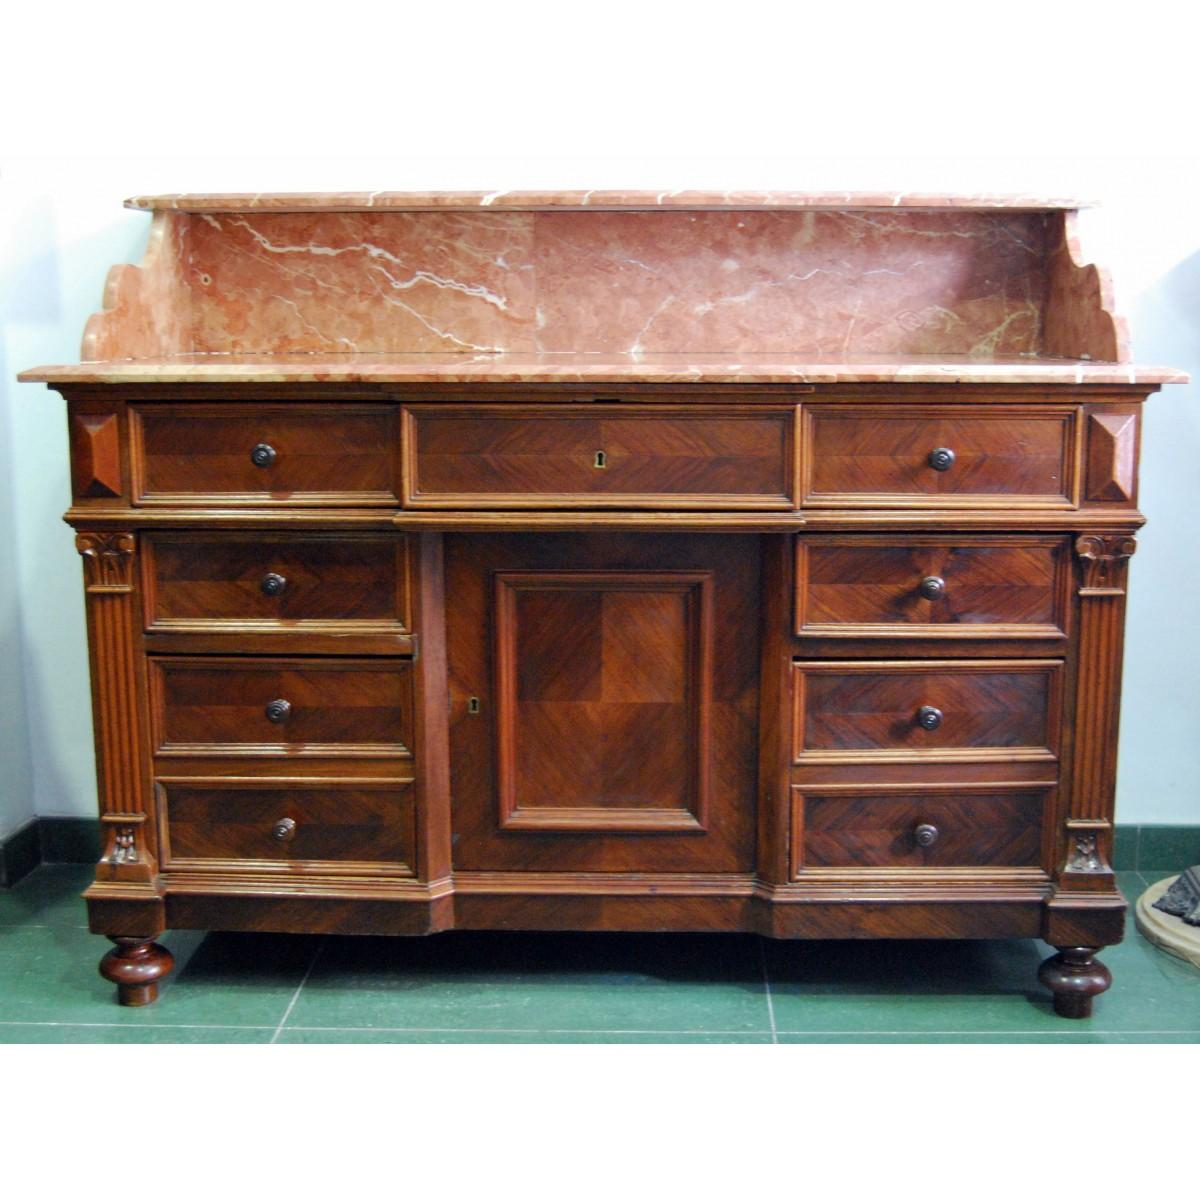 Mueble tocador de finales del siglo XIX.